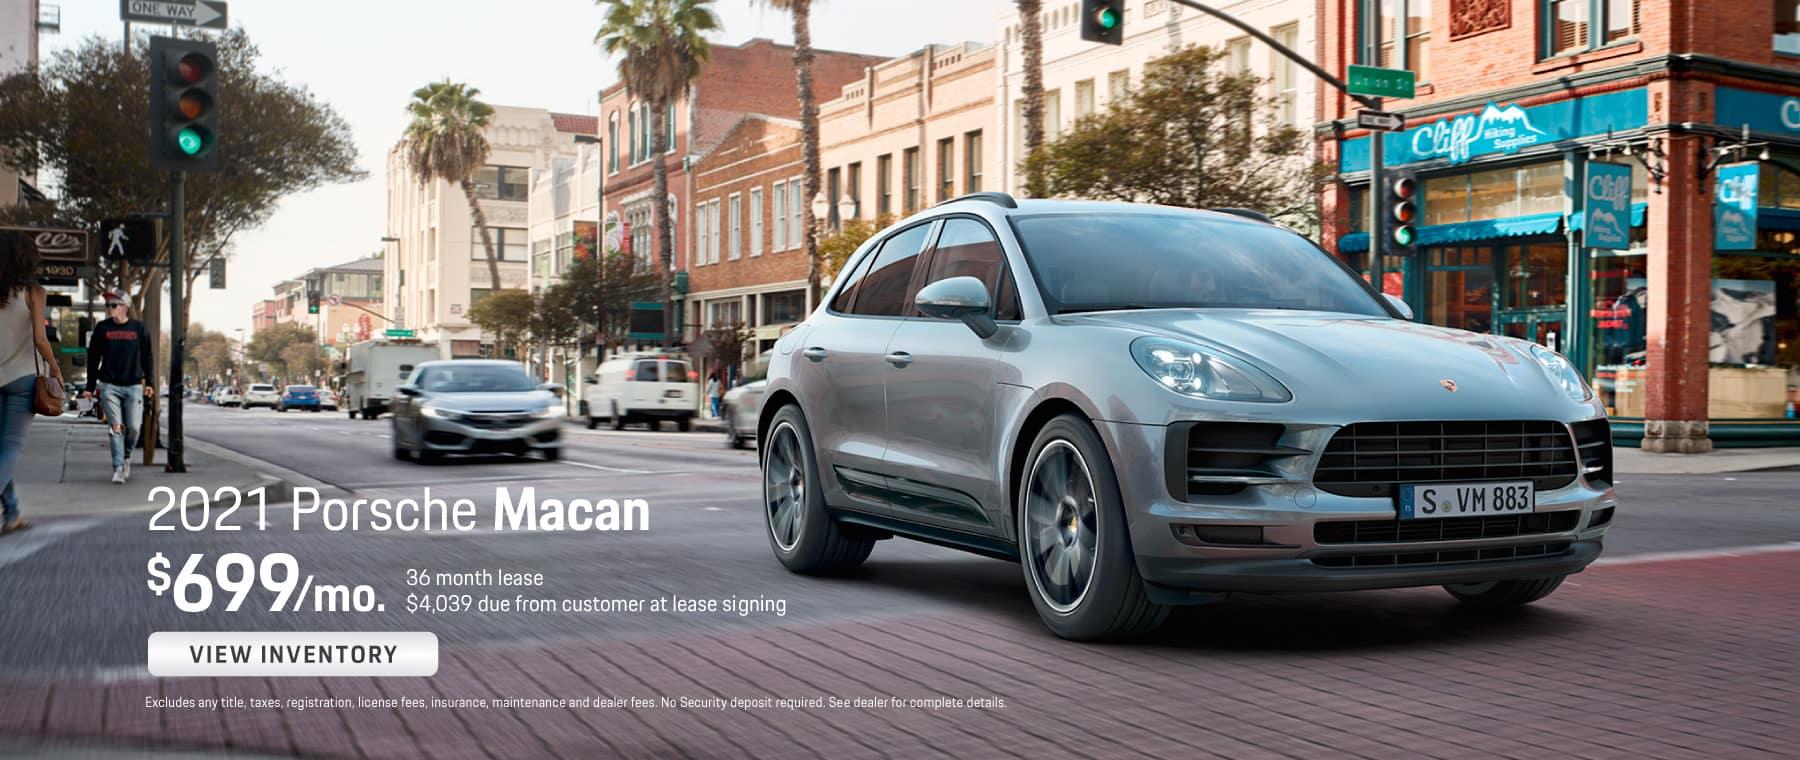 67858-HITM_Porsche_Macan_1800x760 4 5 April